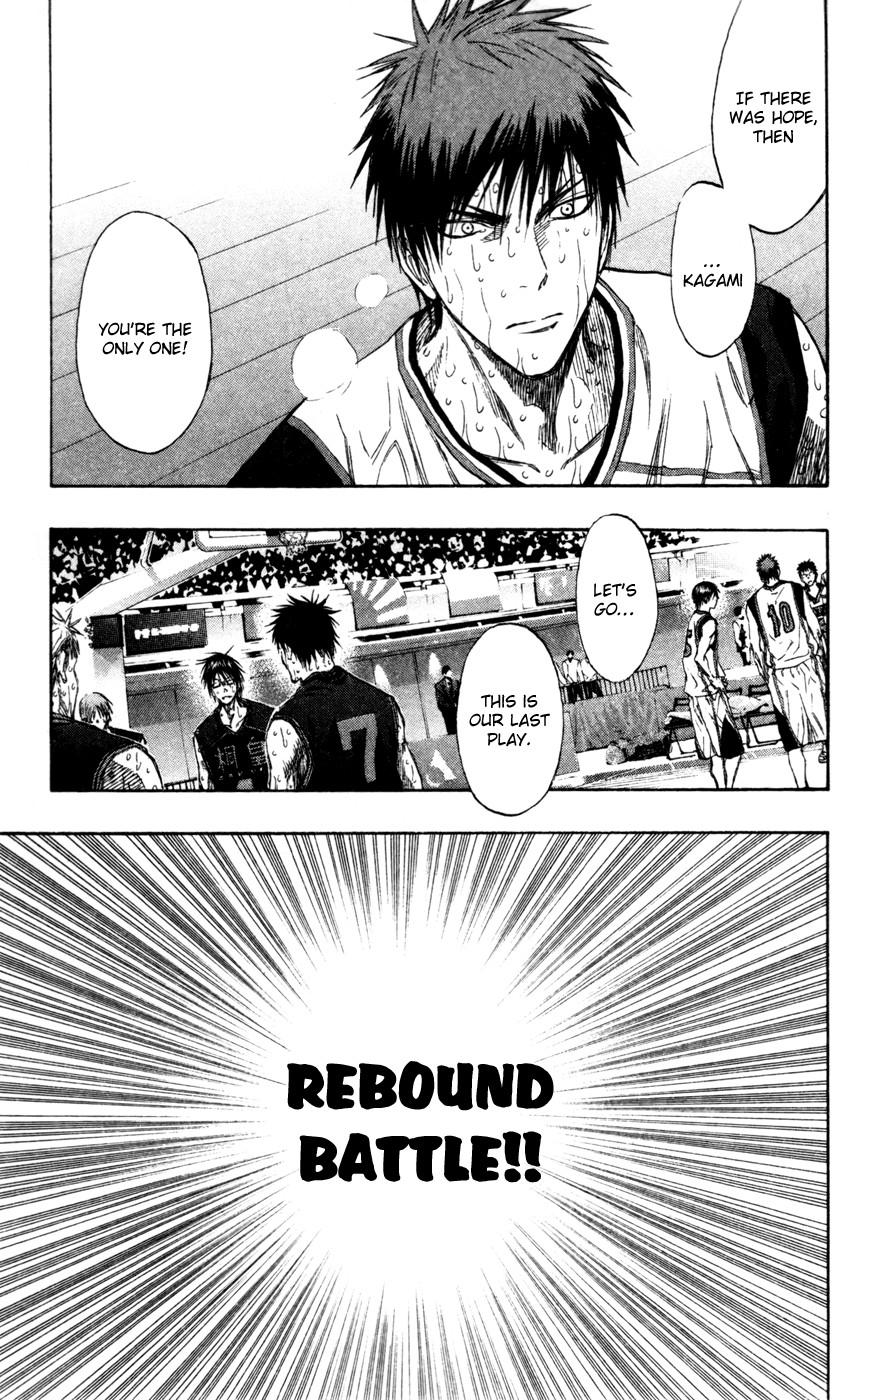 Kuroko no Basket Manga Chapter 138 - Image 09